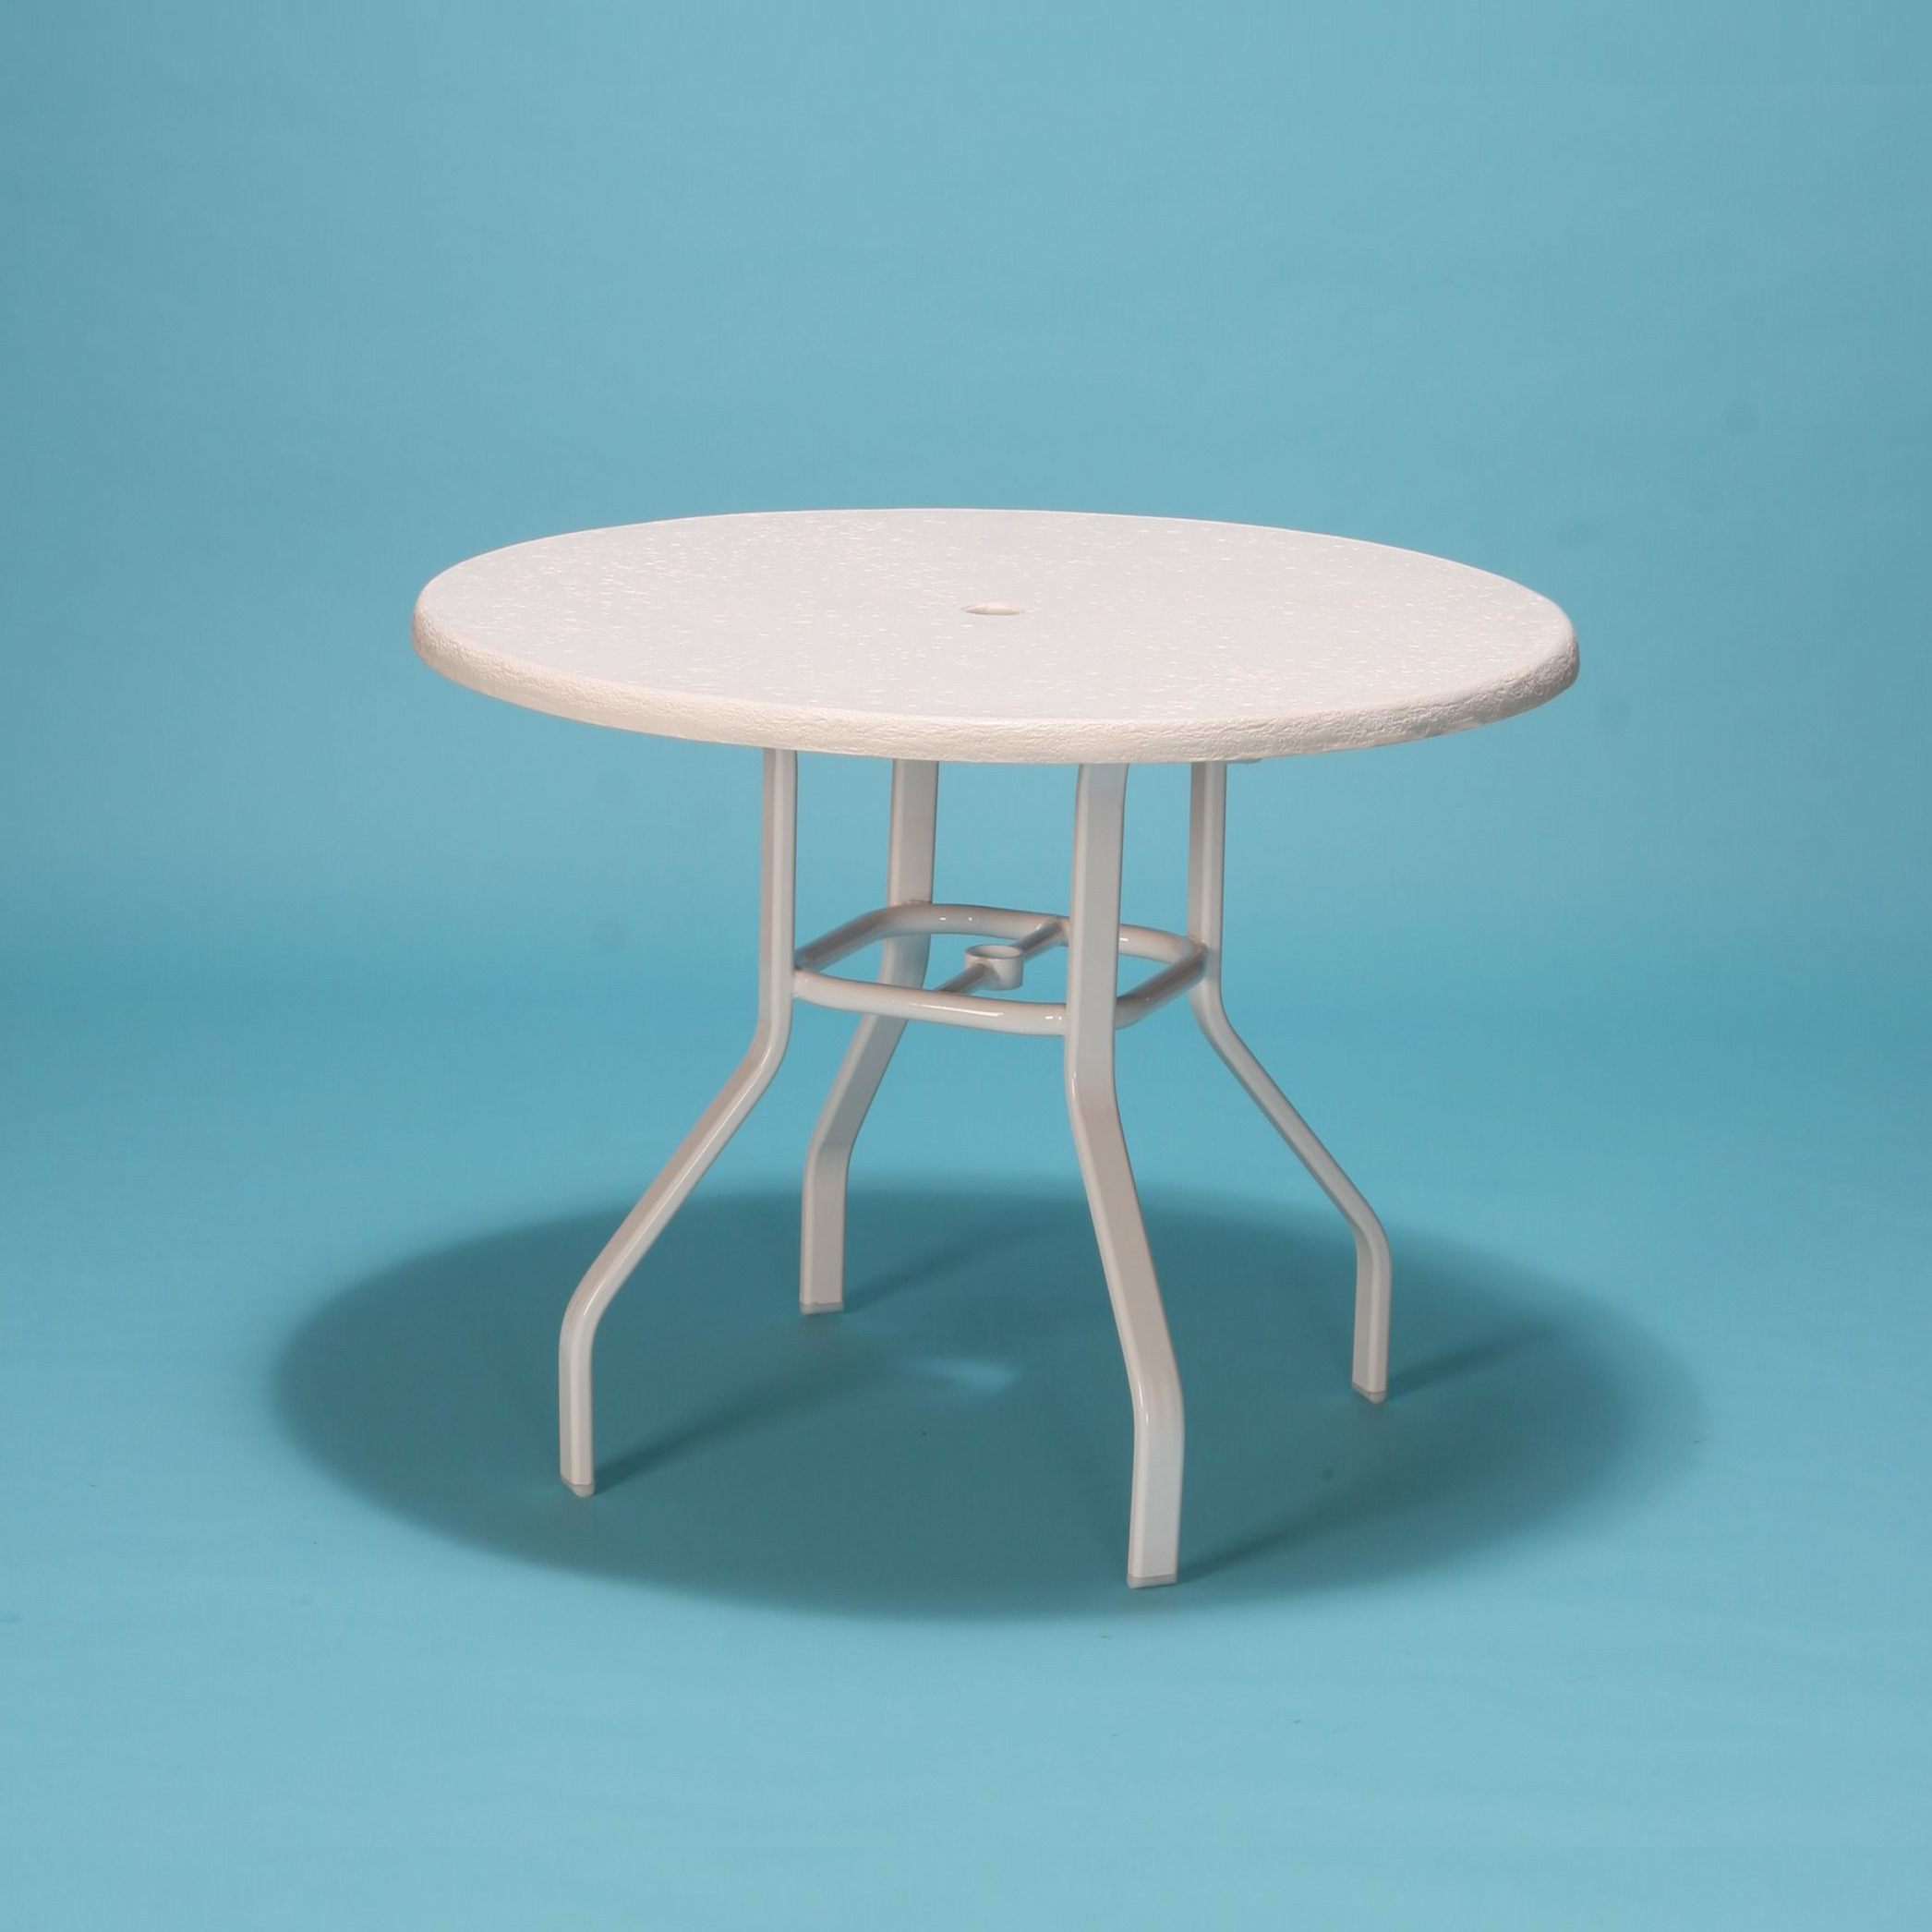 48 Quot Commercial Grade Round Fiberglass Top Table Patio